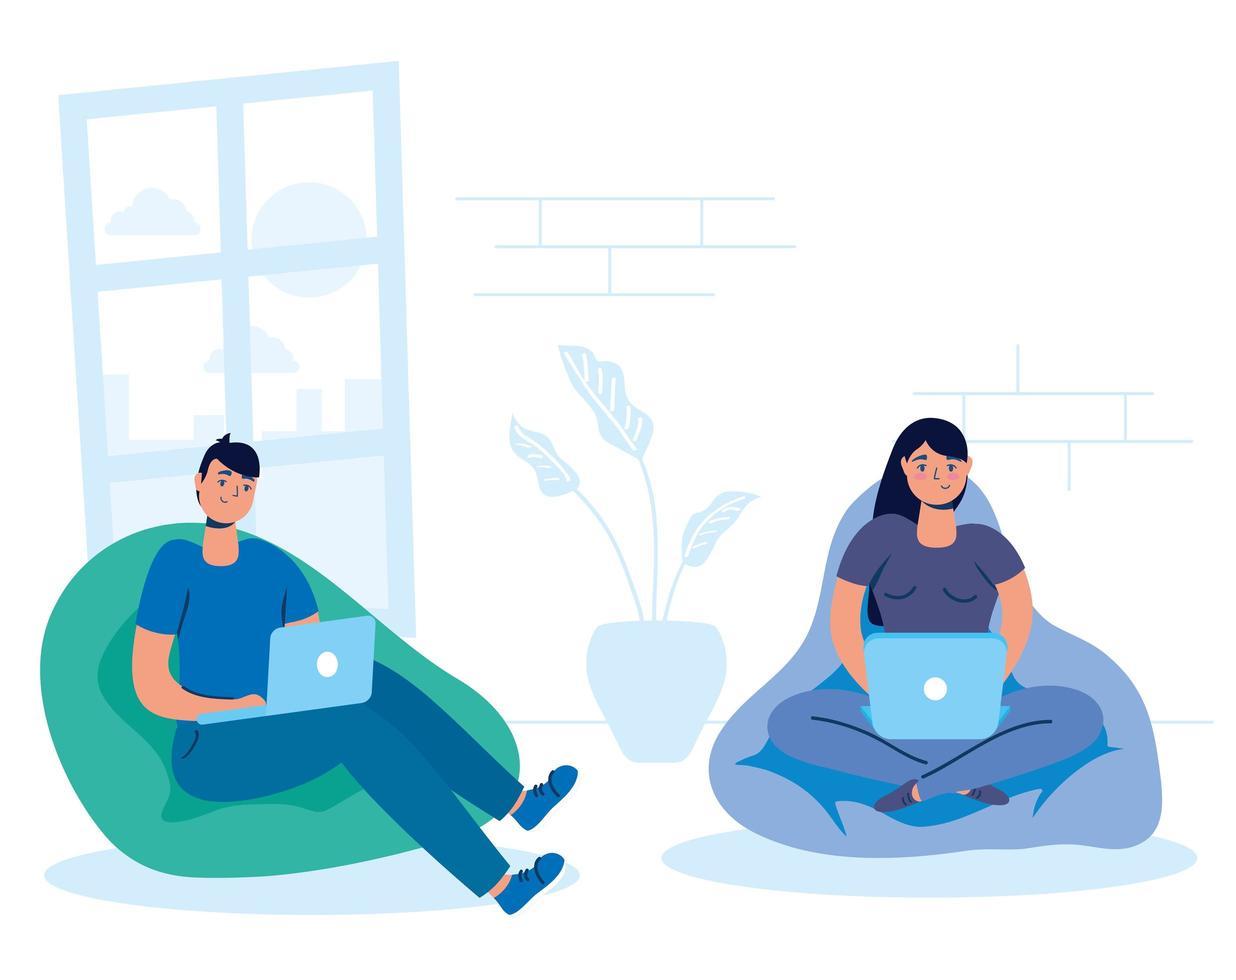 pareja en la computadora portátil en casa vector